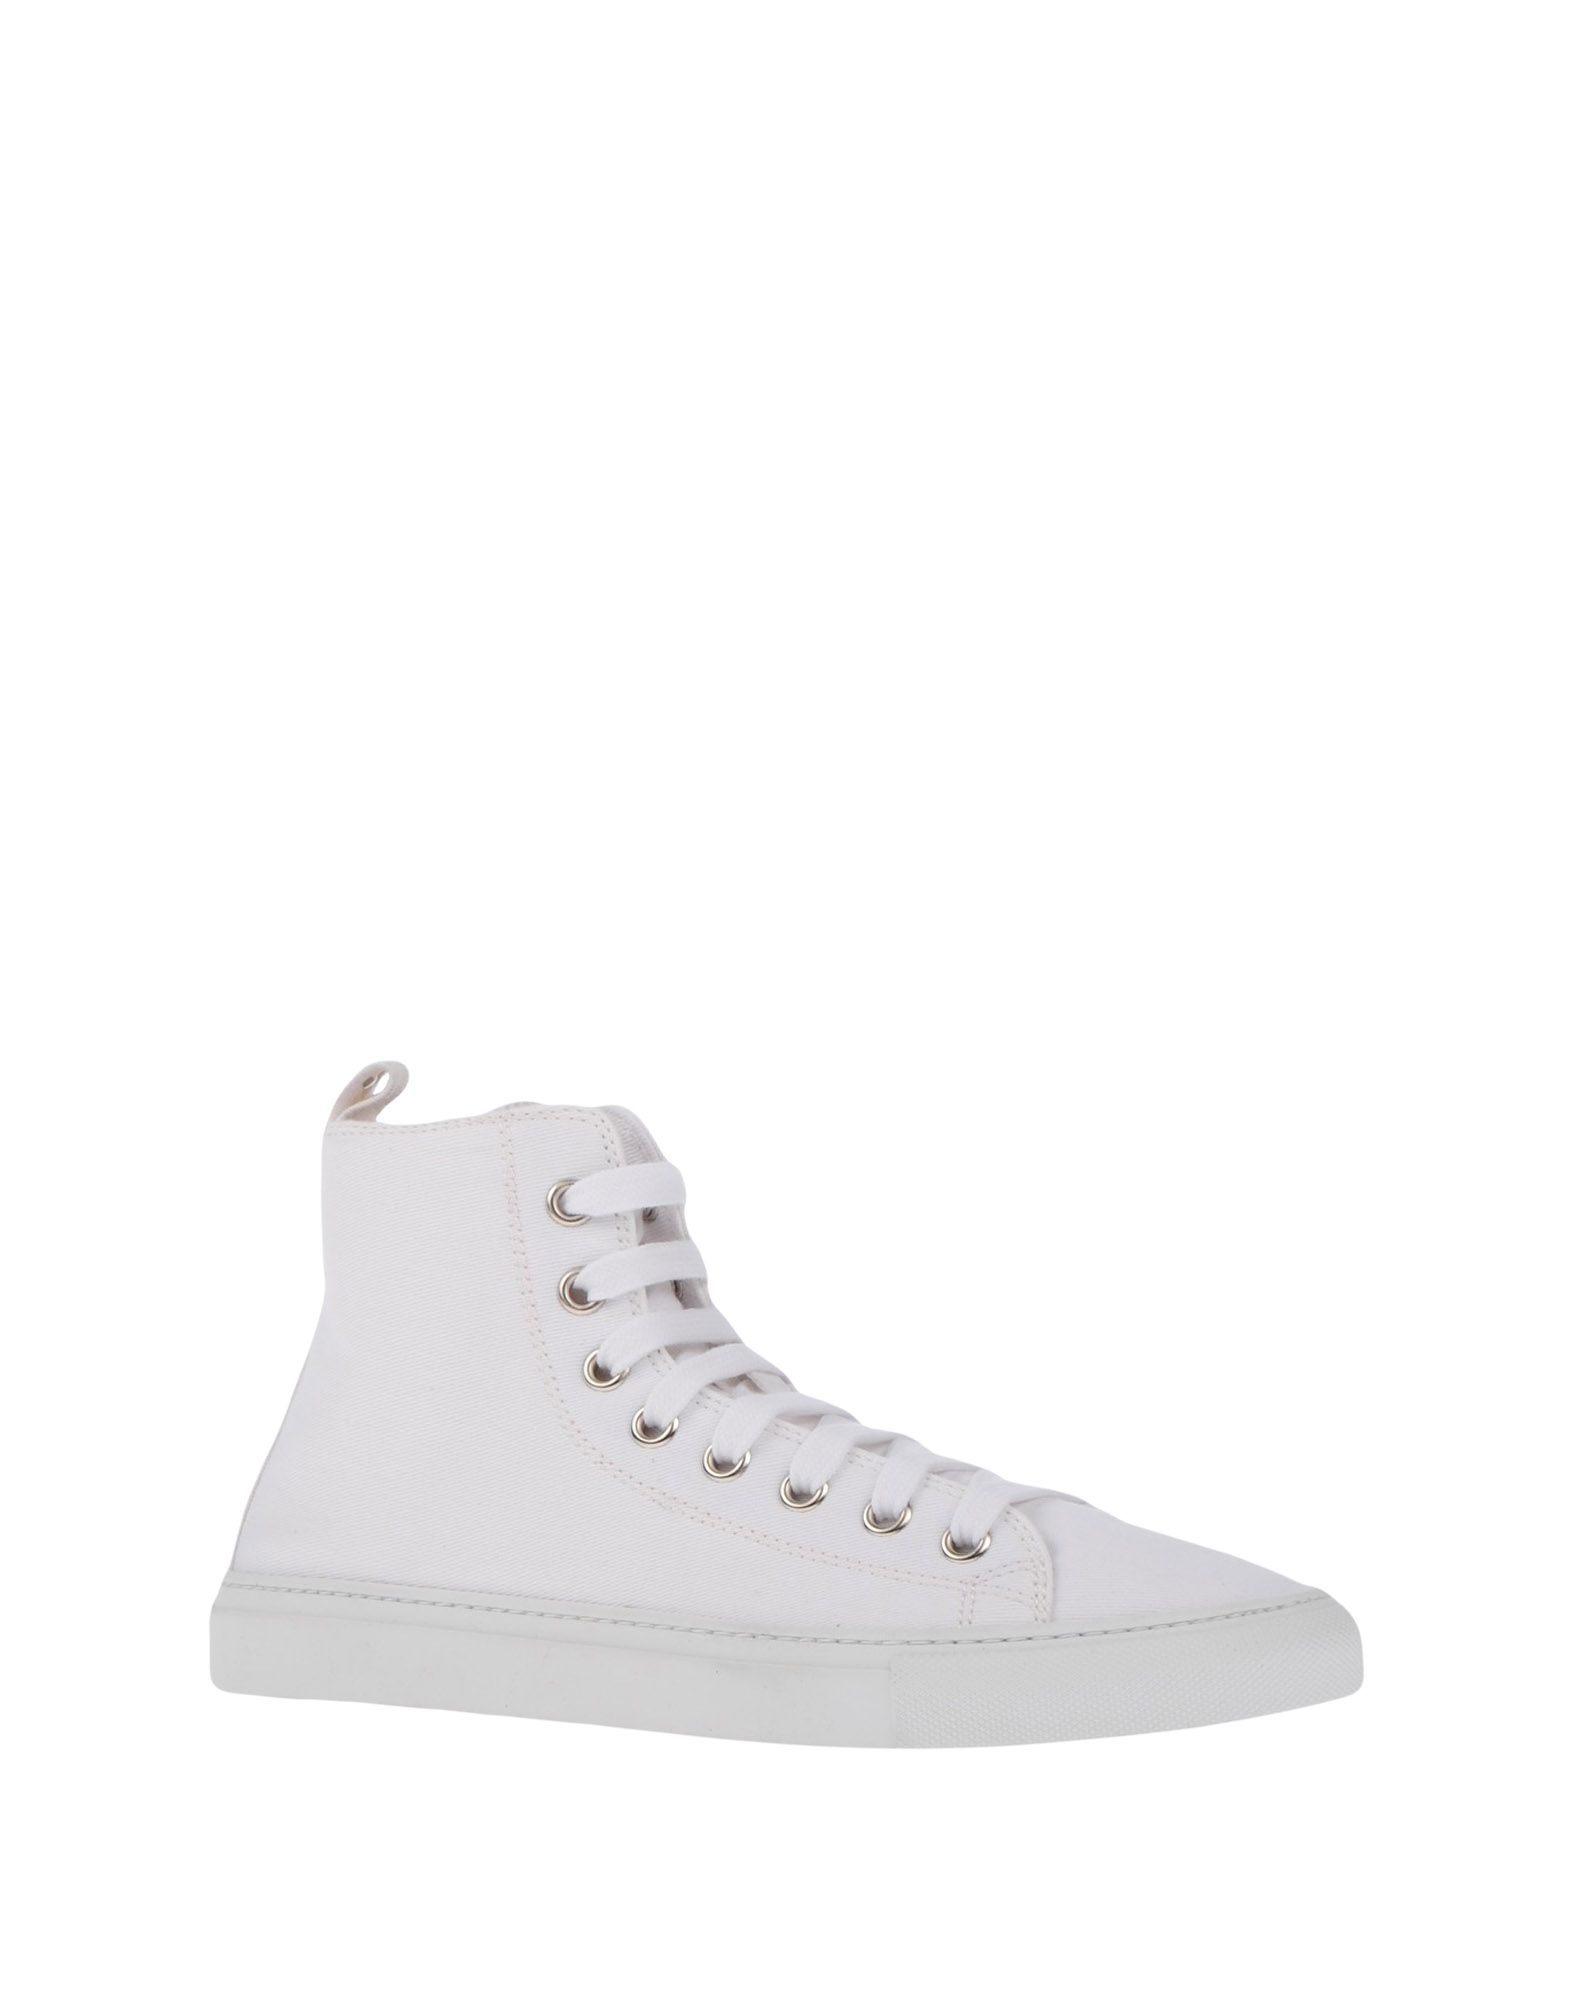 Dsquared2 11428251IX Sneakers Herren  11428251IX Dsquared2 Gute Qualität beliebte Schuhe 9c6315